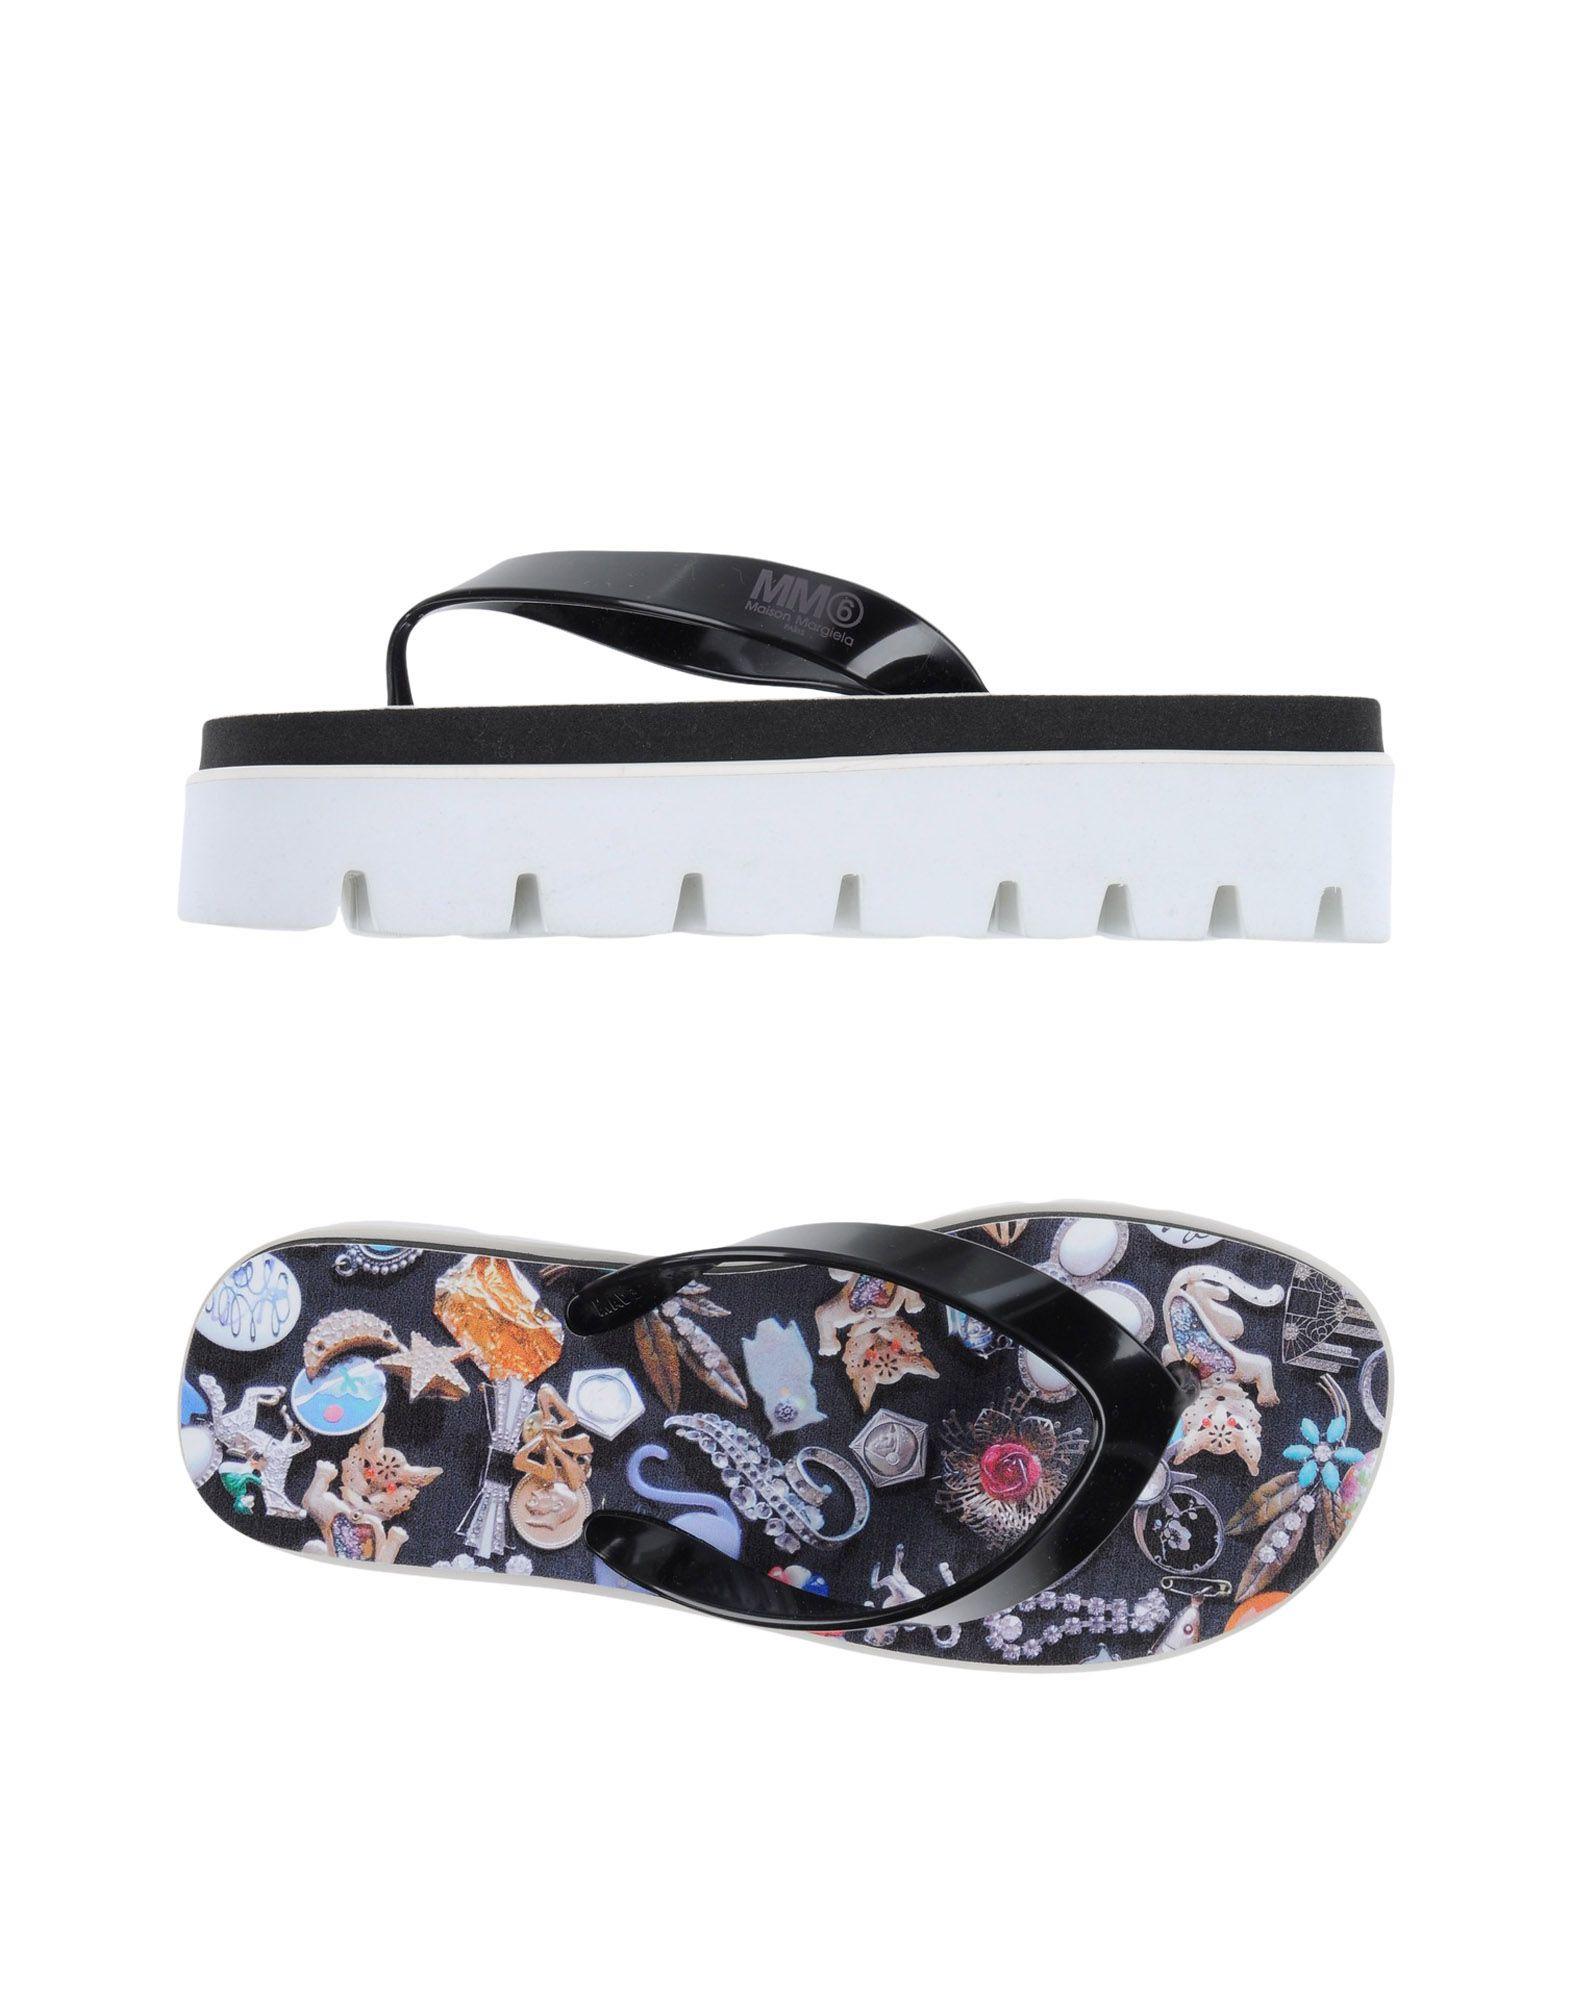 Mm6 Maison Margiela Flip Flops - Women Mm6 Maison on Margiela Flip Flops online on Maison  Australia - 11114980WC 7b9e51